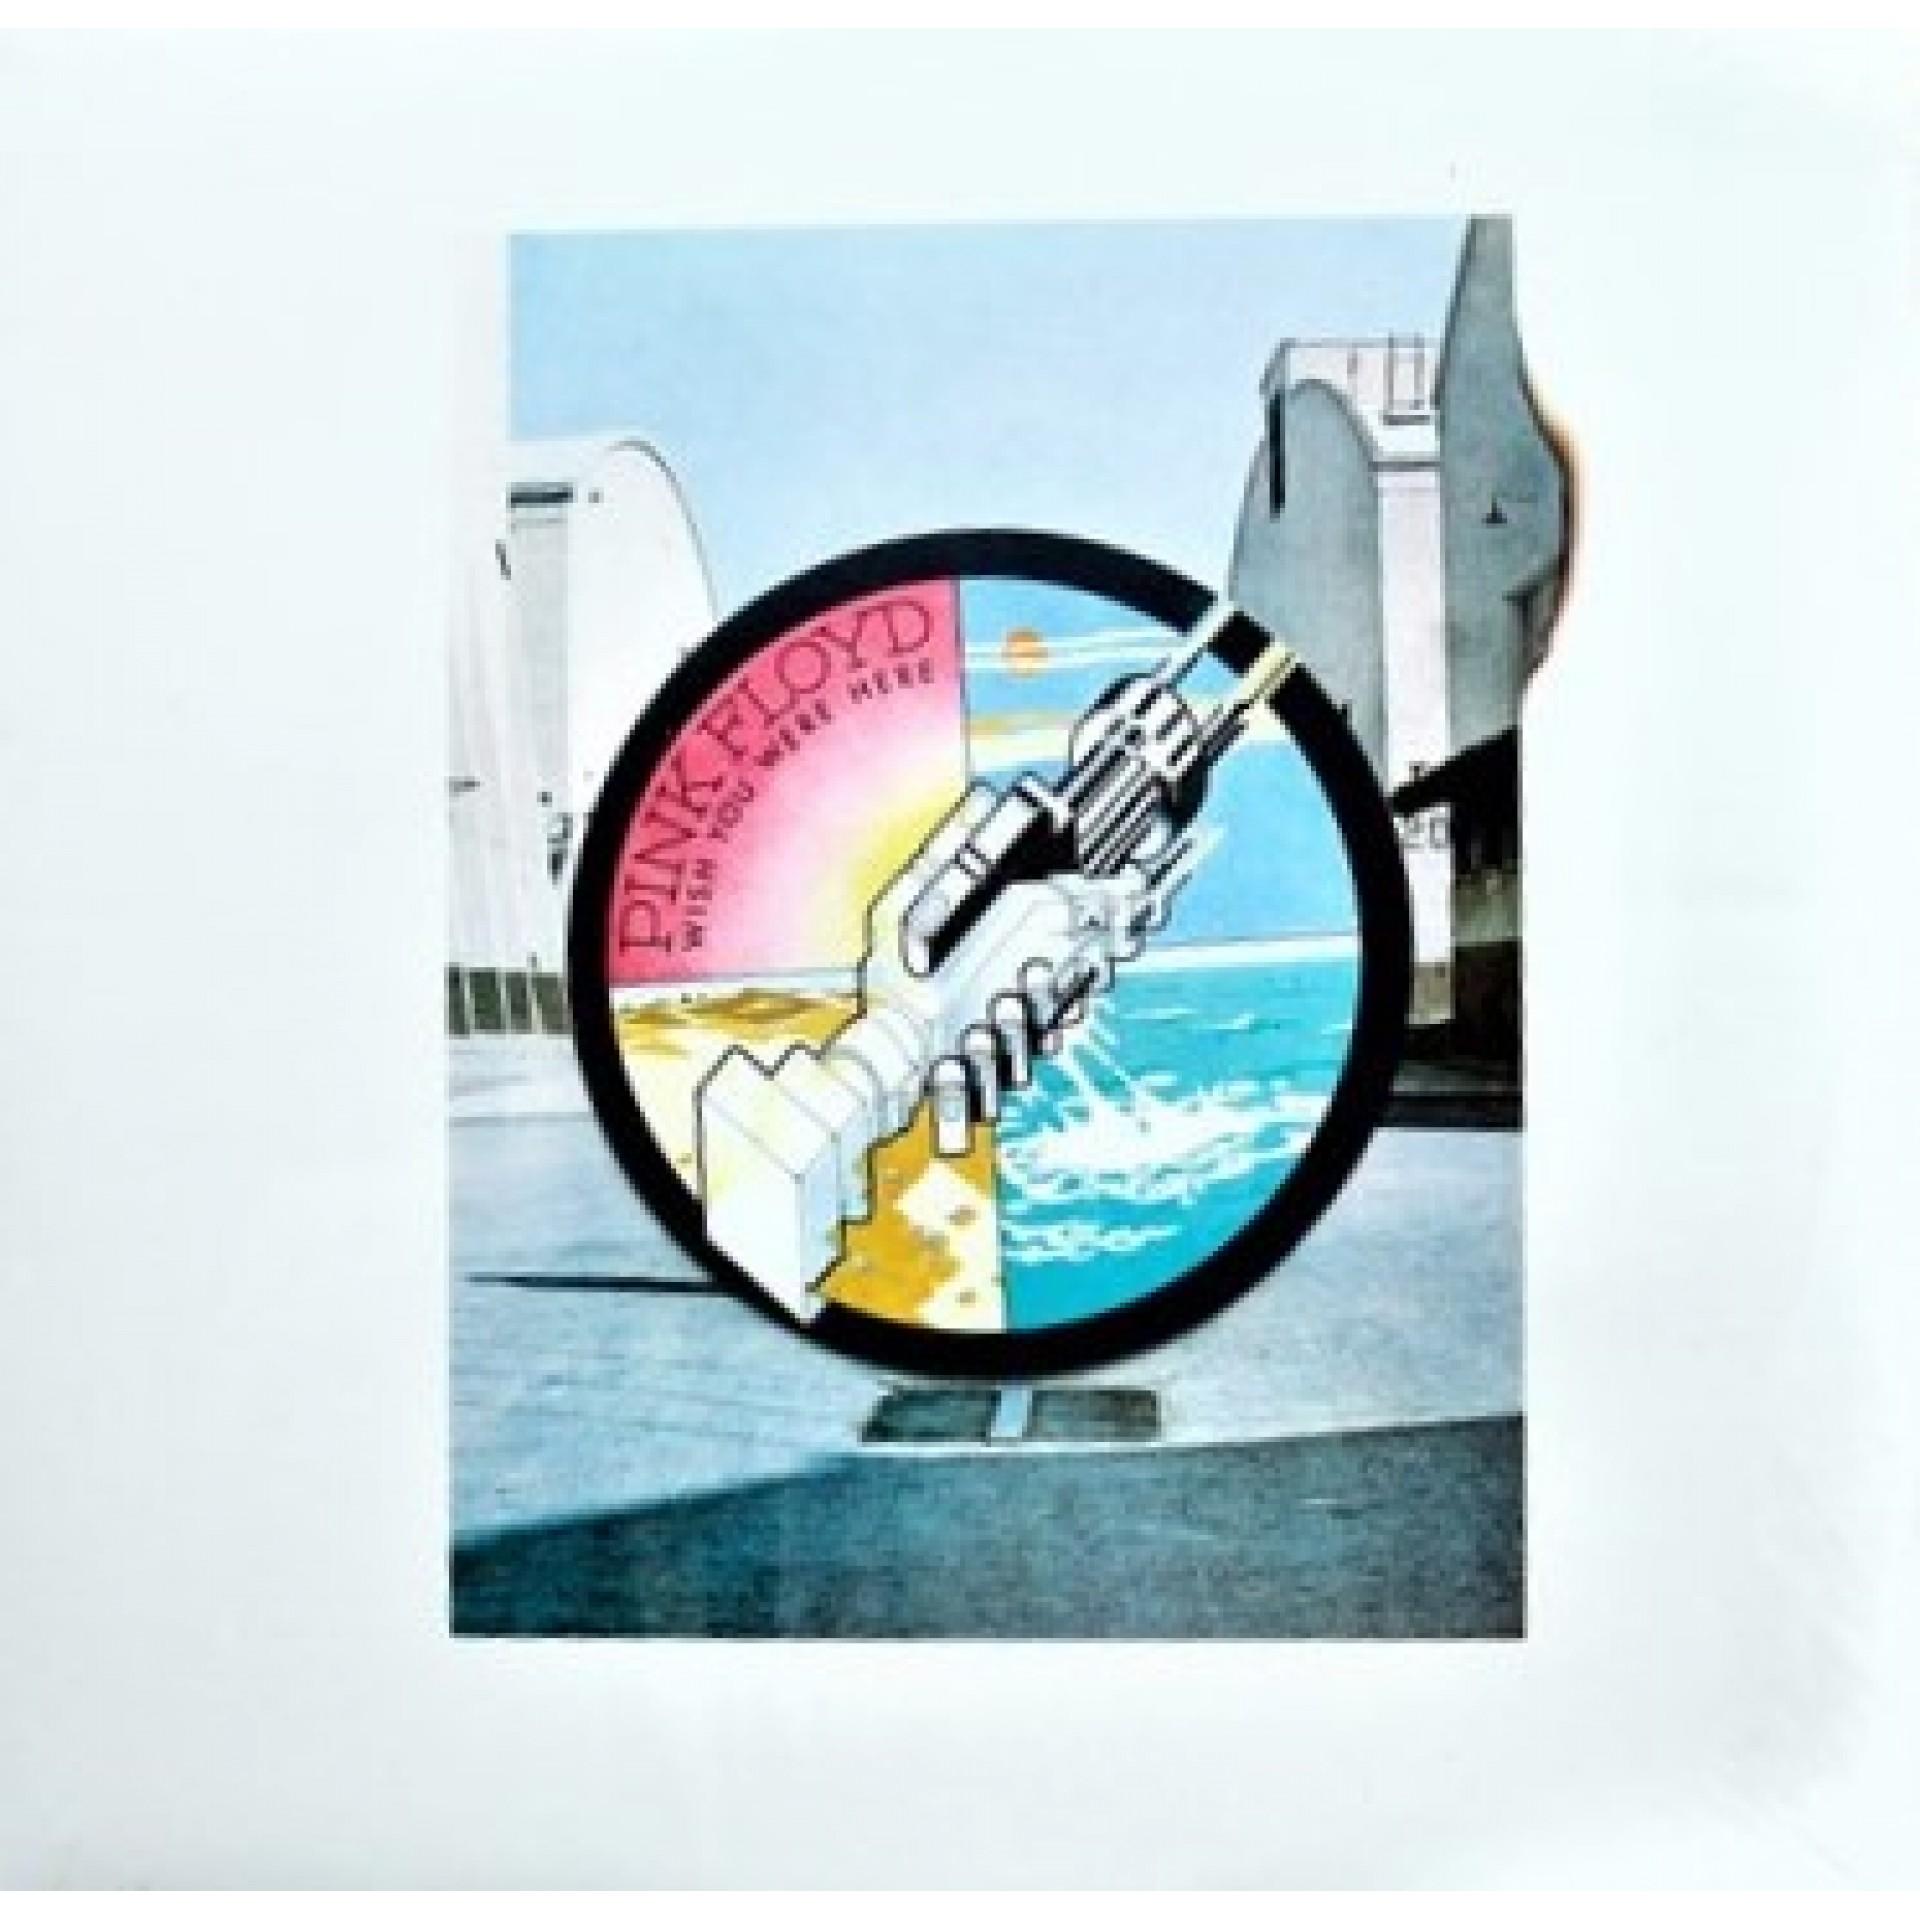 Pink Floyd Wish You Were Here LP Vinyl